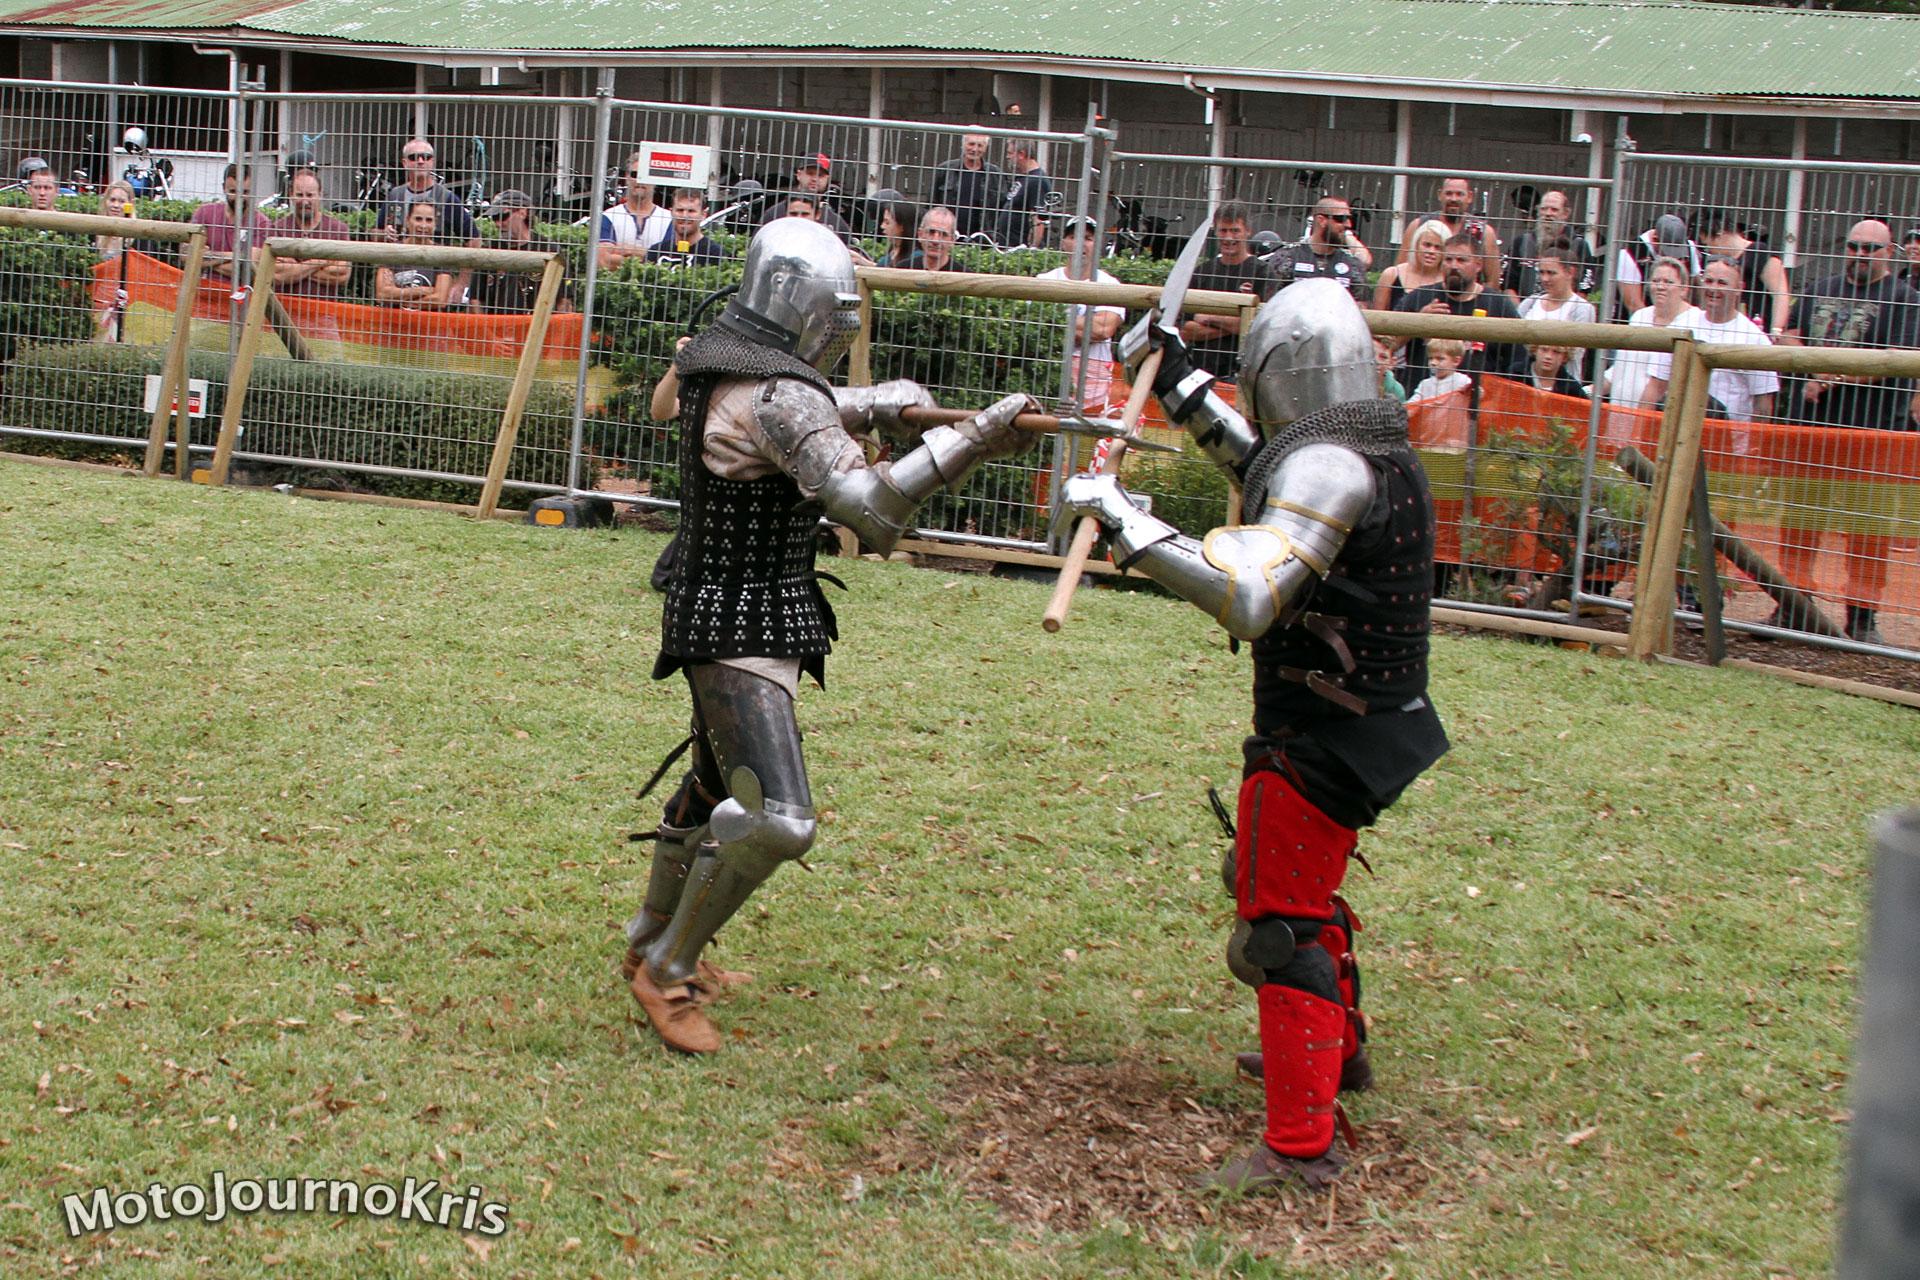 Australian Medieval Combat